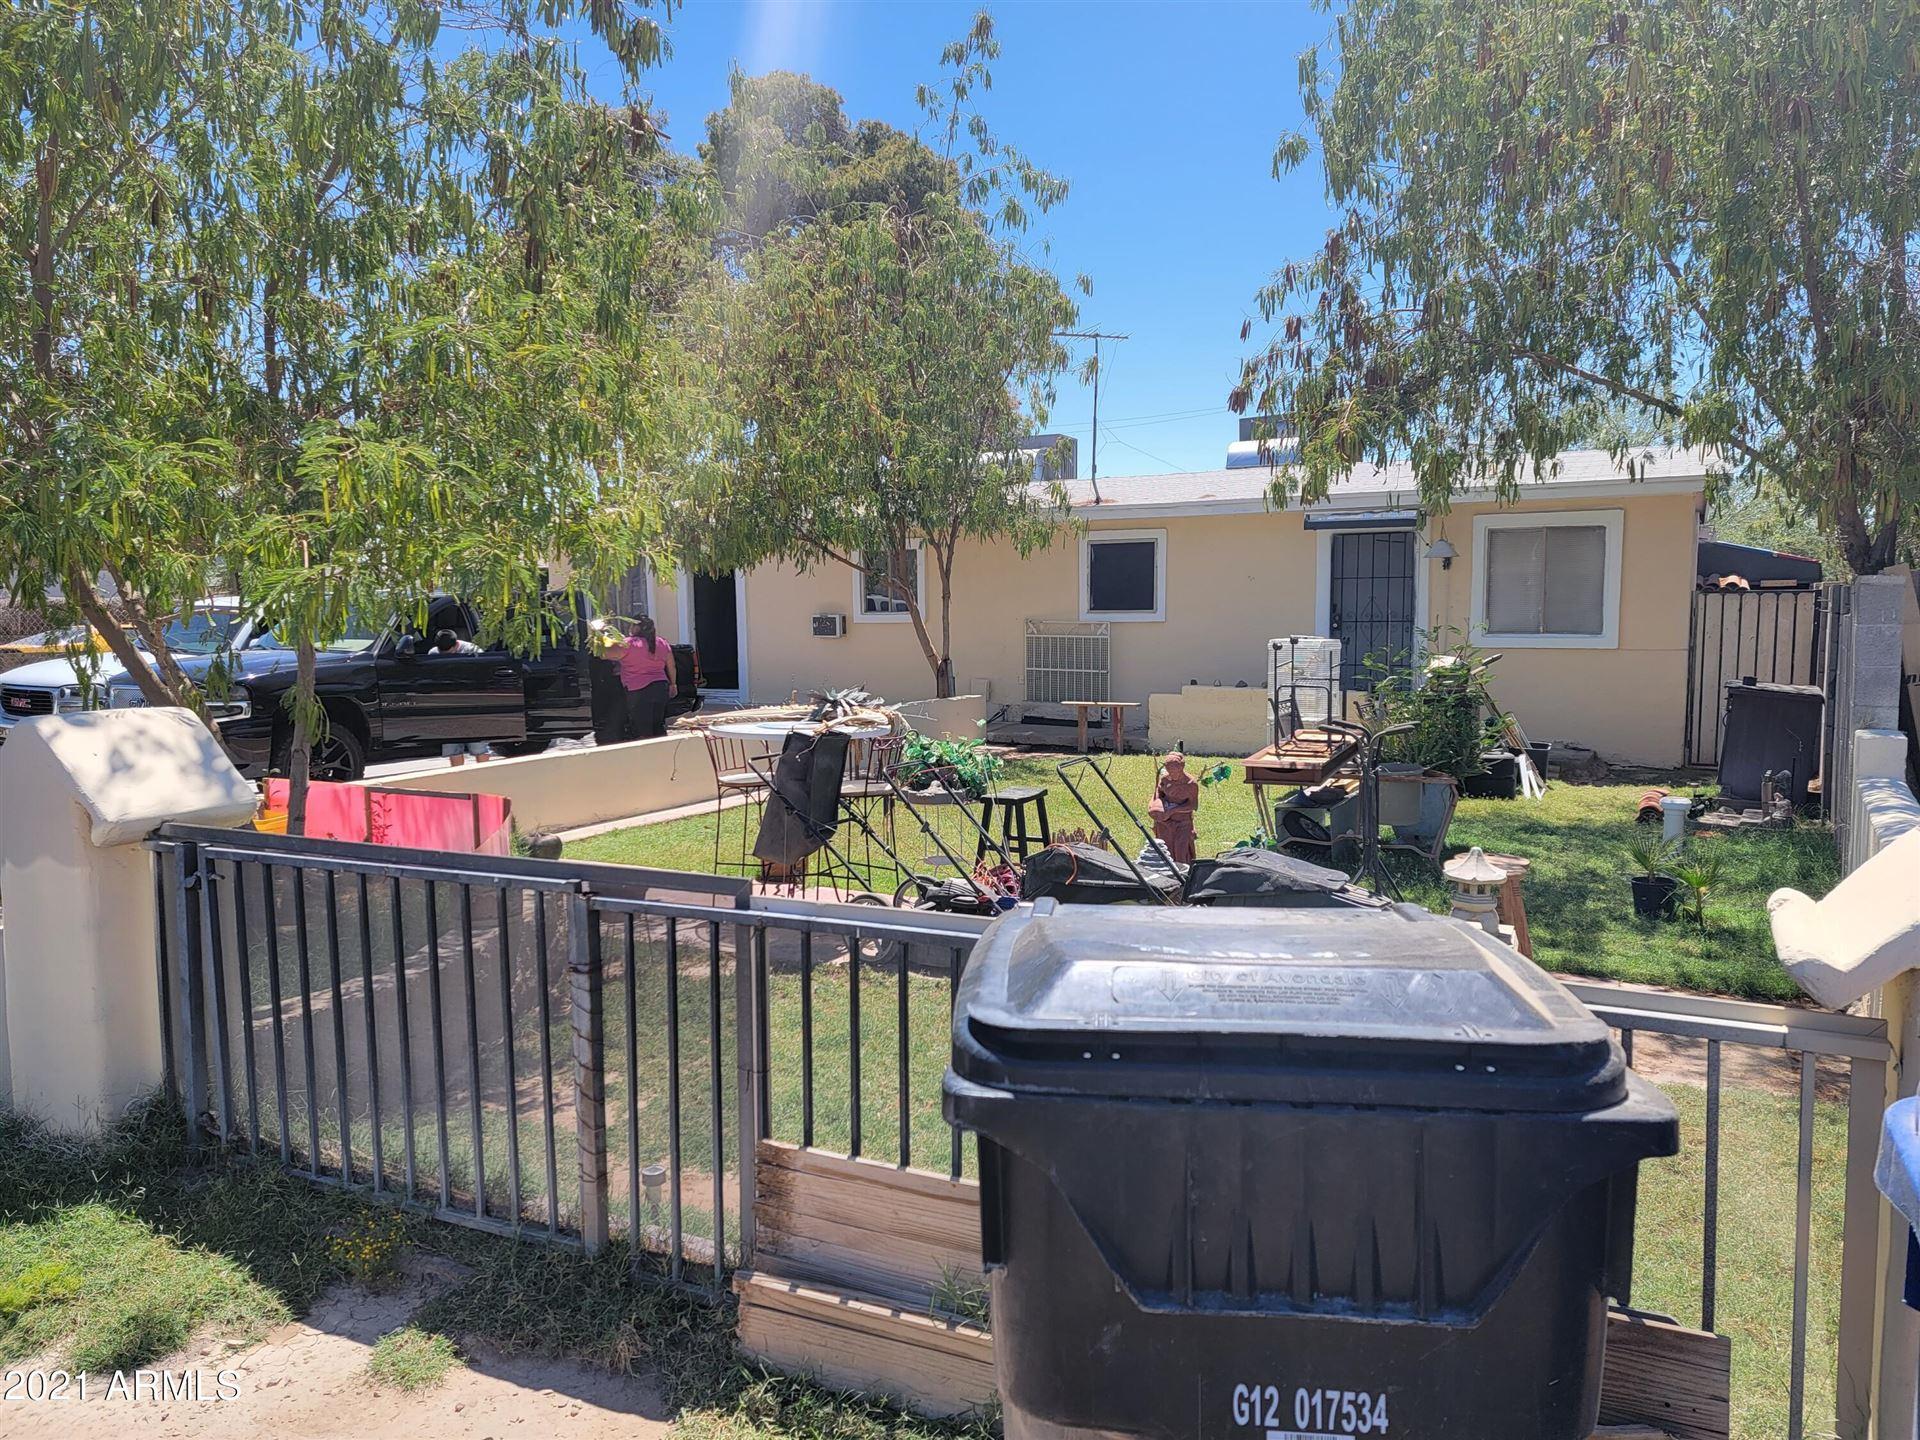 Photo of 814 S GREENLEAF Lane, Avondale, AZ 85323 (MLS # 6250098)